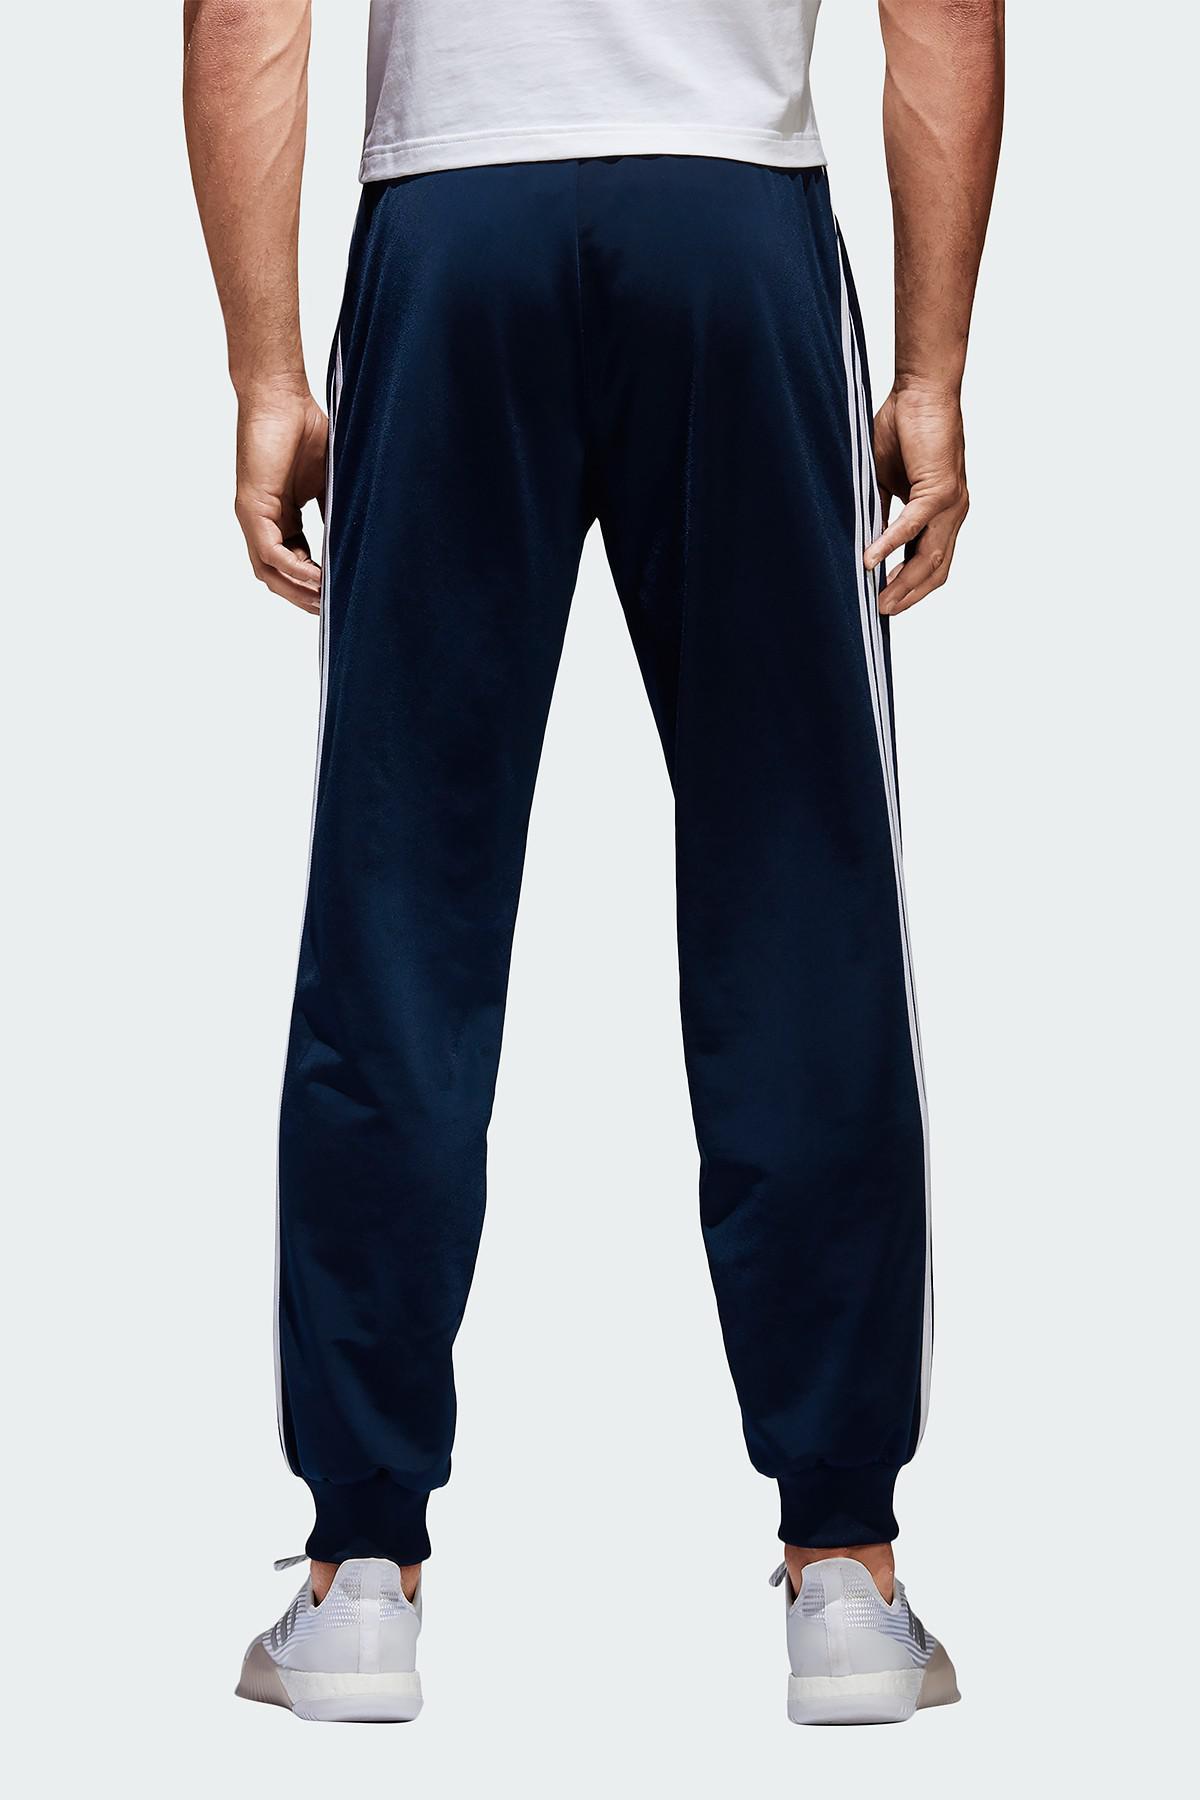 4e3cf0705 adidas Essentials 3-stripes Jogger in Blue for Men - Lyst